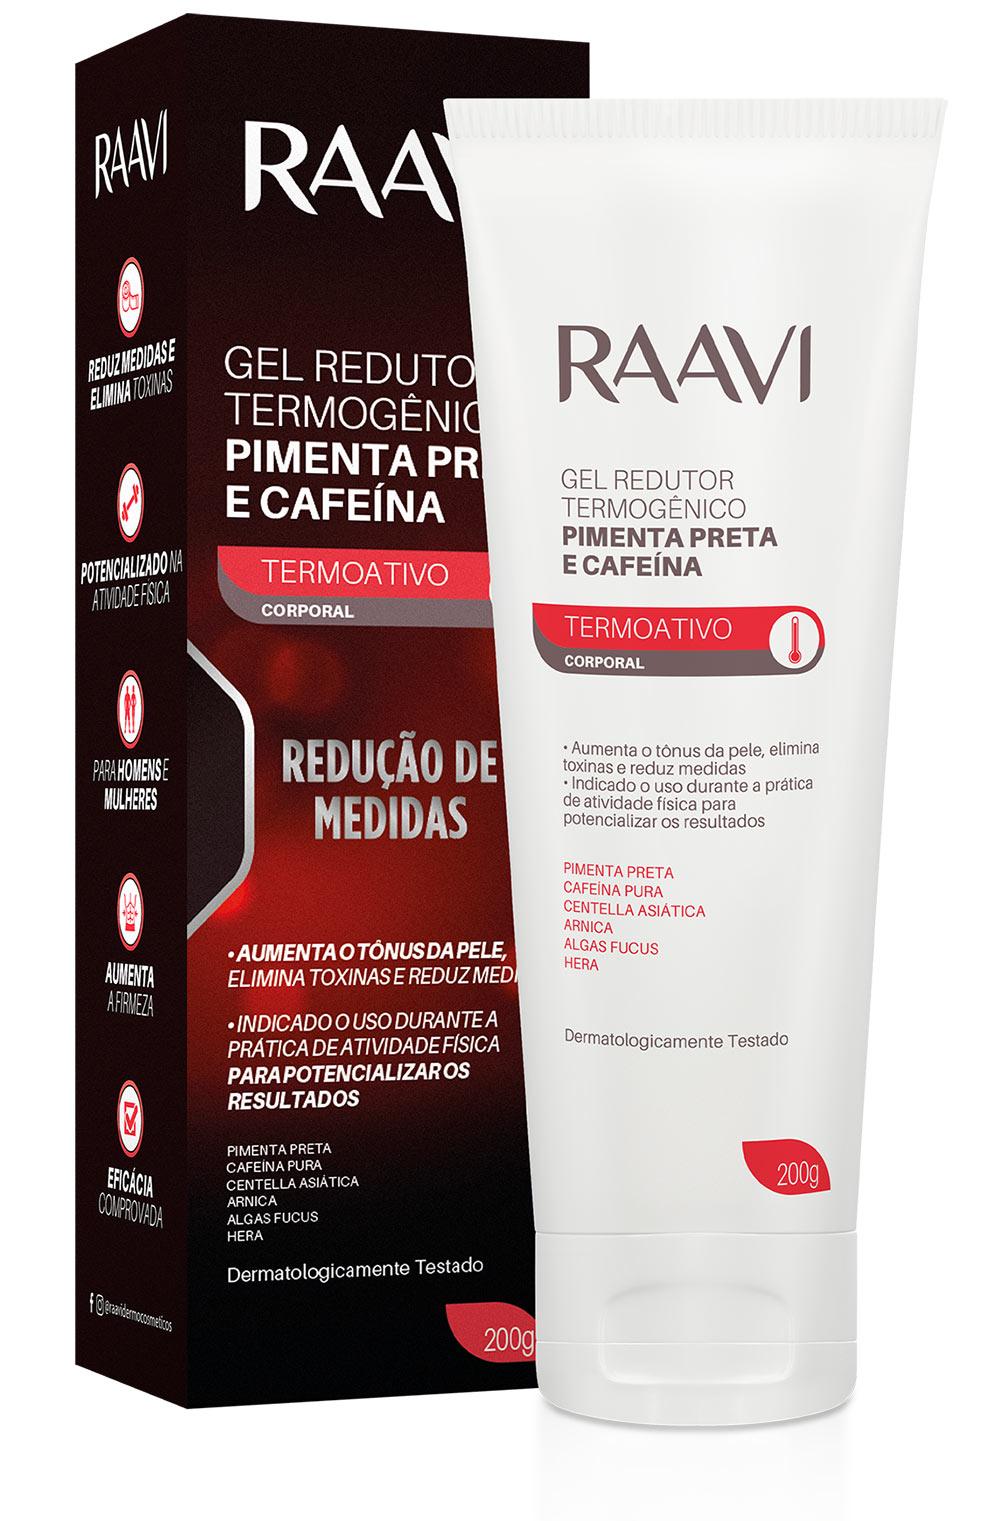 Gel Redutor de Medidas Raavi Termogenico Pimenta Preta e Cafeina 200g - CX c/ 6